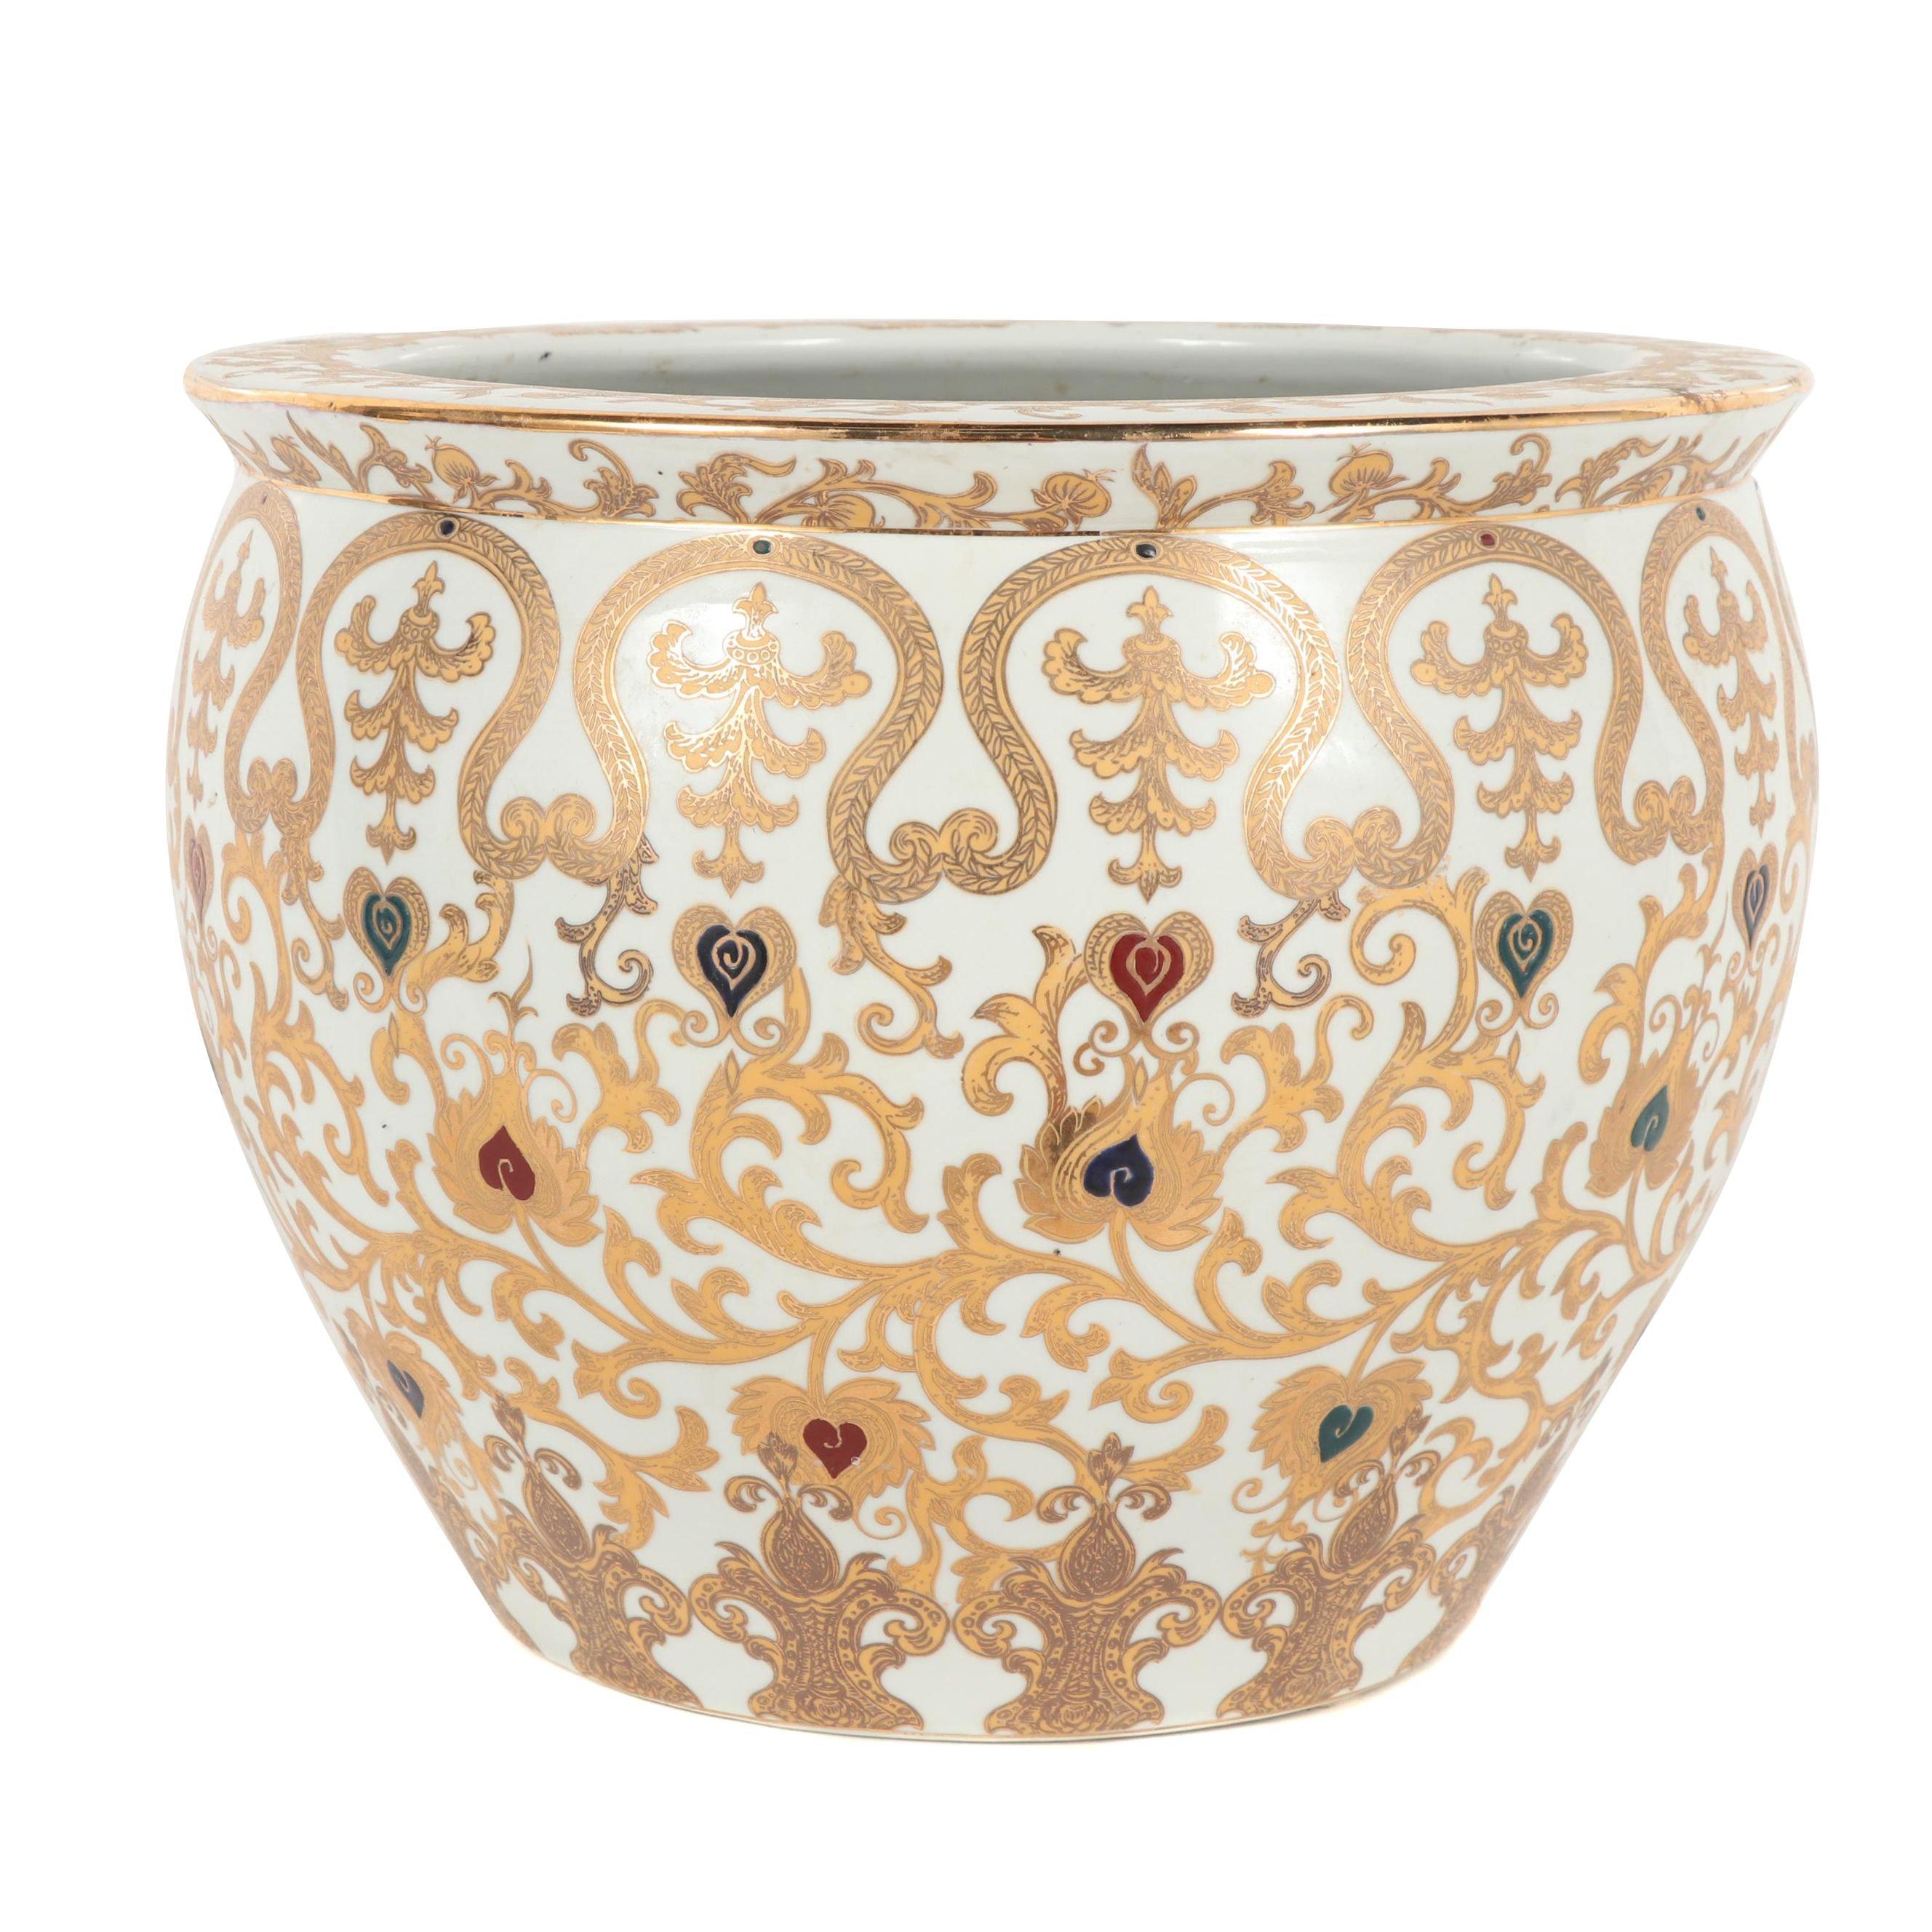 Oriental Accents Asian Ceramic Planter